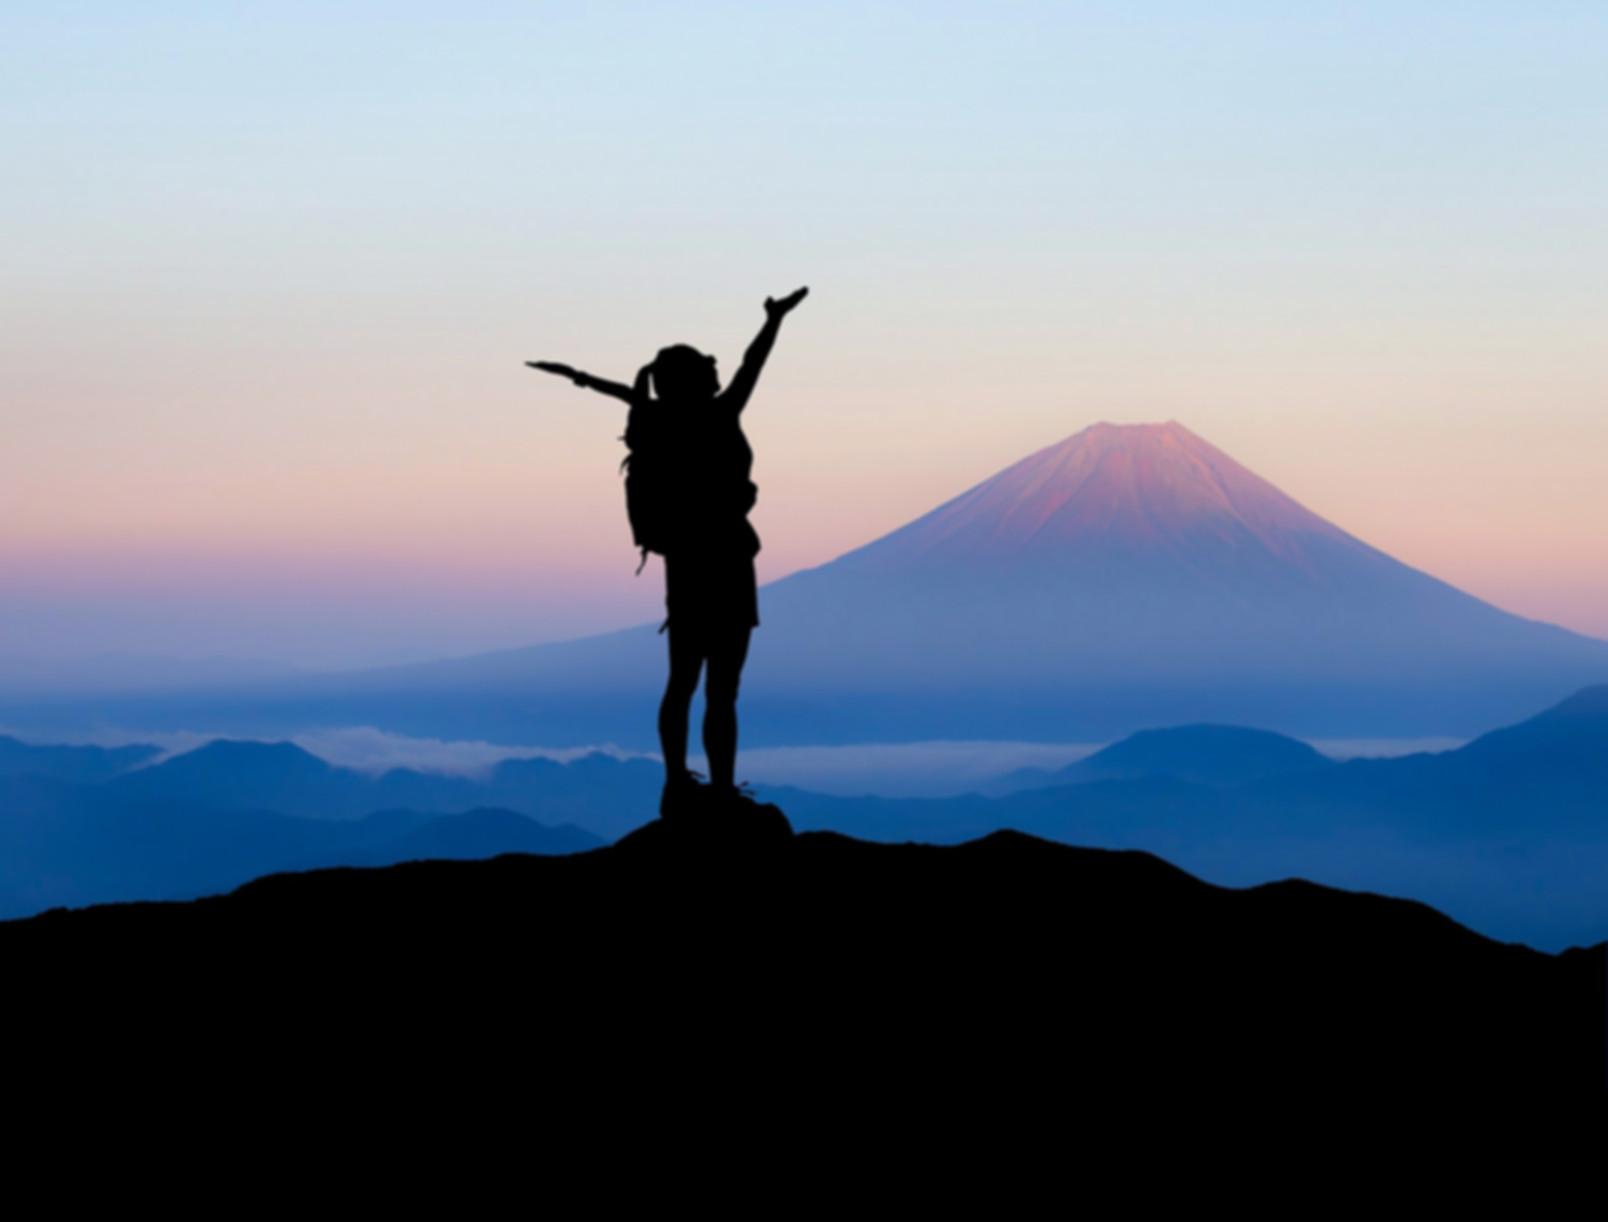 Woman explorer on mountain.jpg